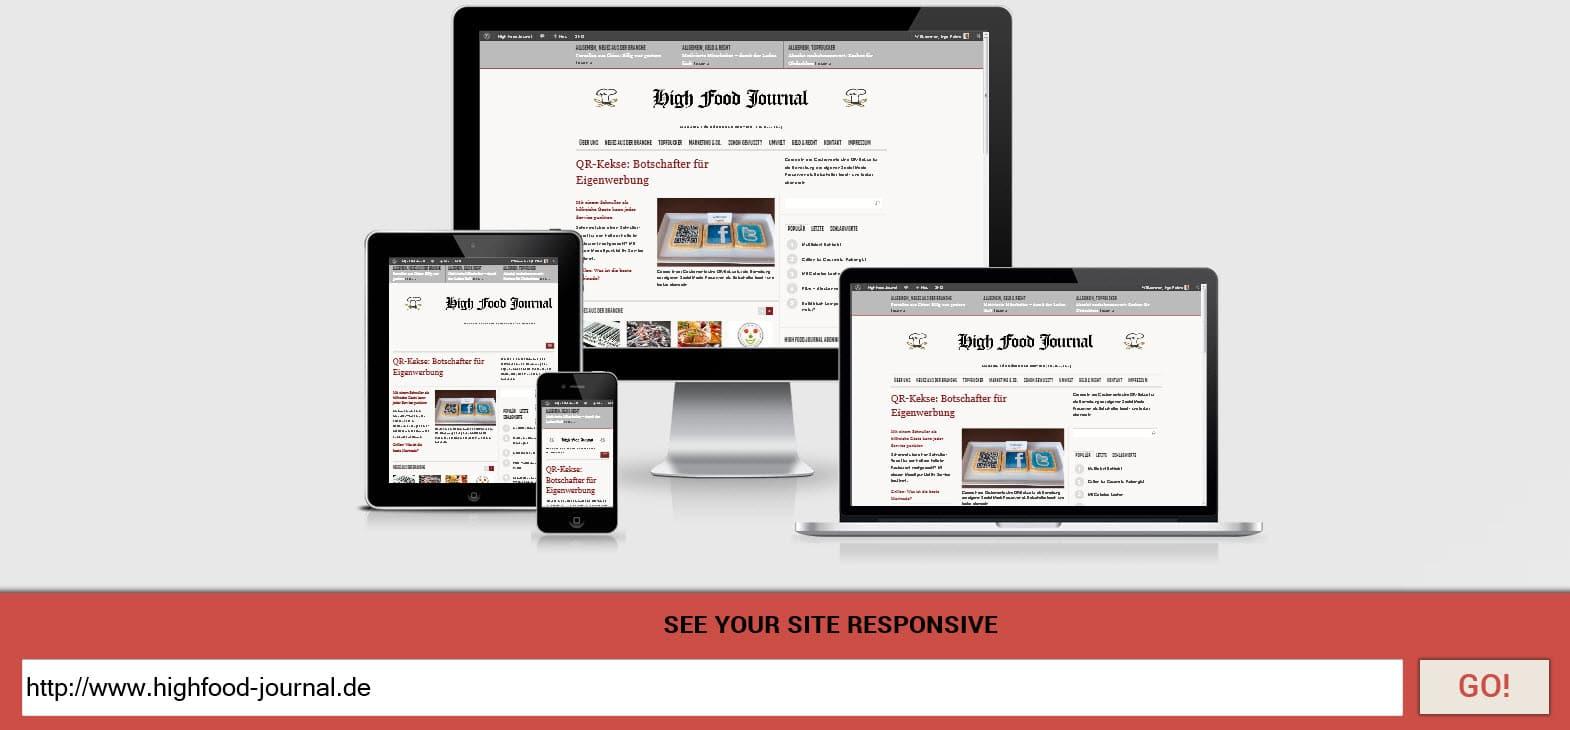 Responsive Webdesign passt sich in der Darstellung den Ausgabegeräten an